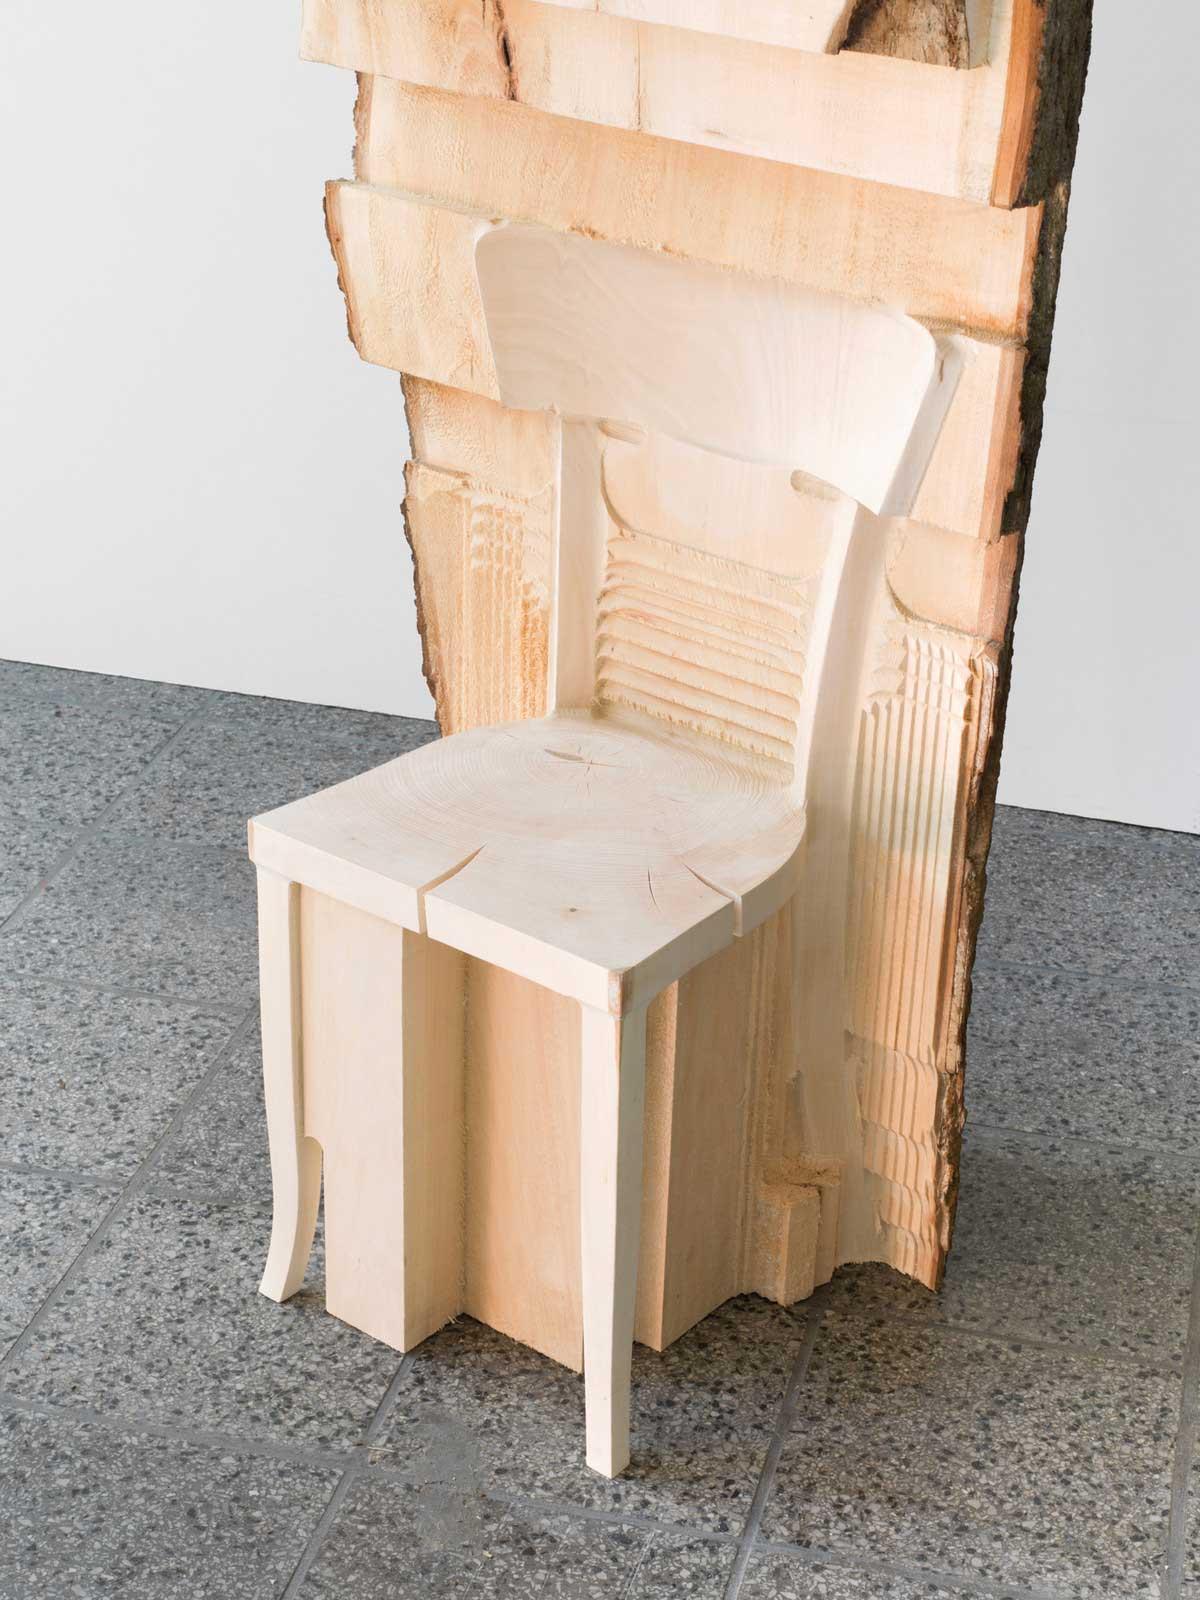 Alicja Kwade schnitzt Möbelstücke in Baumstämme Alicja-Kwade_holzskulpturen_02